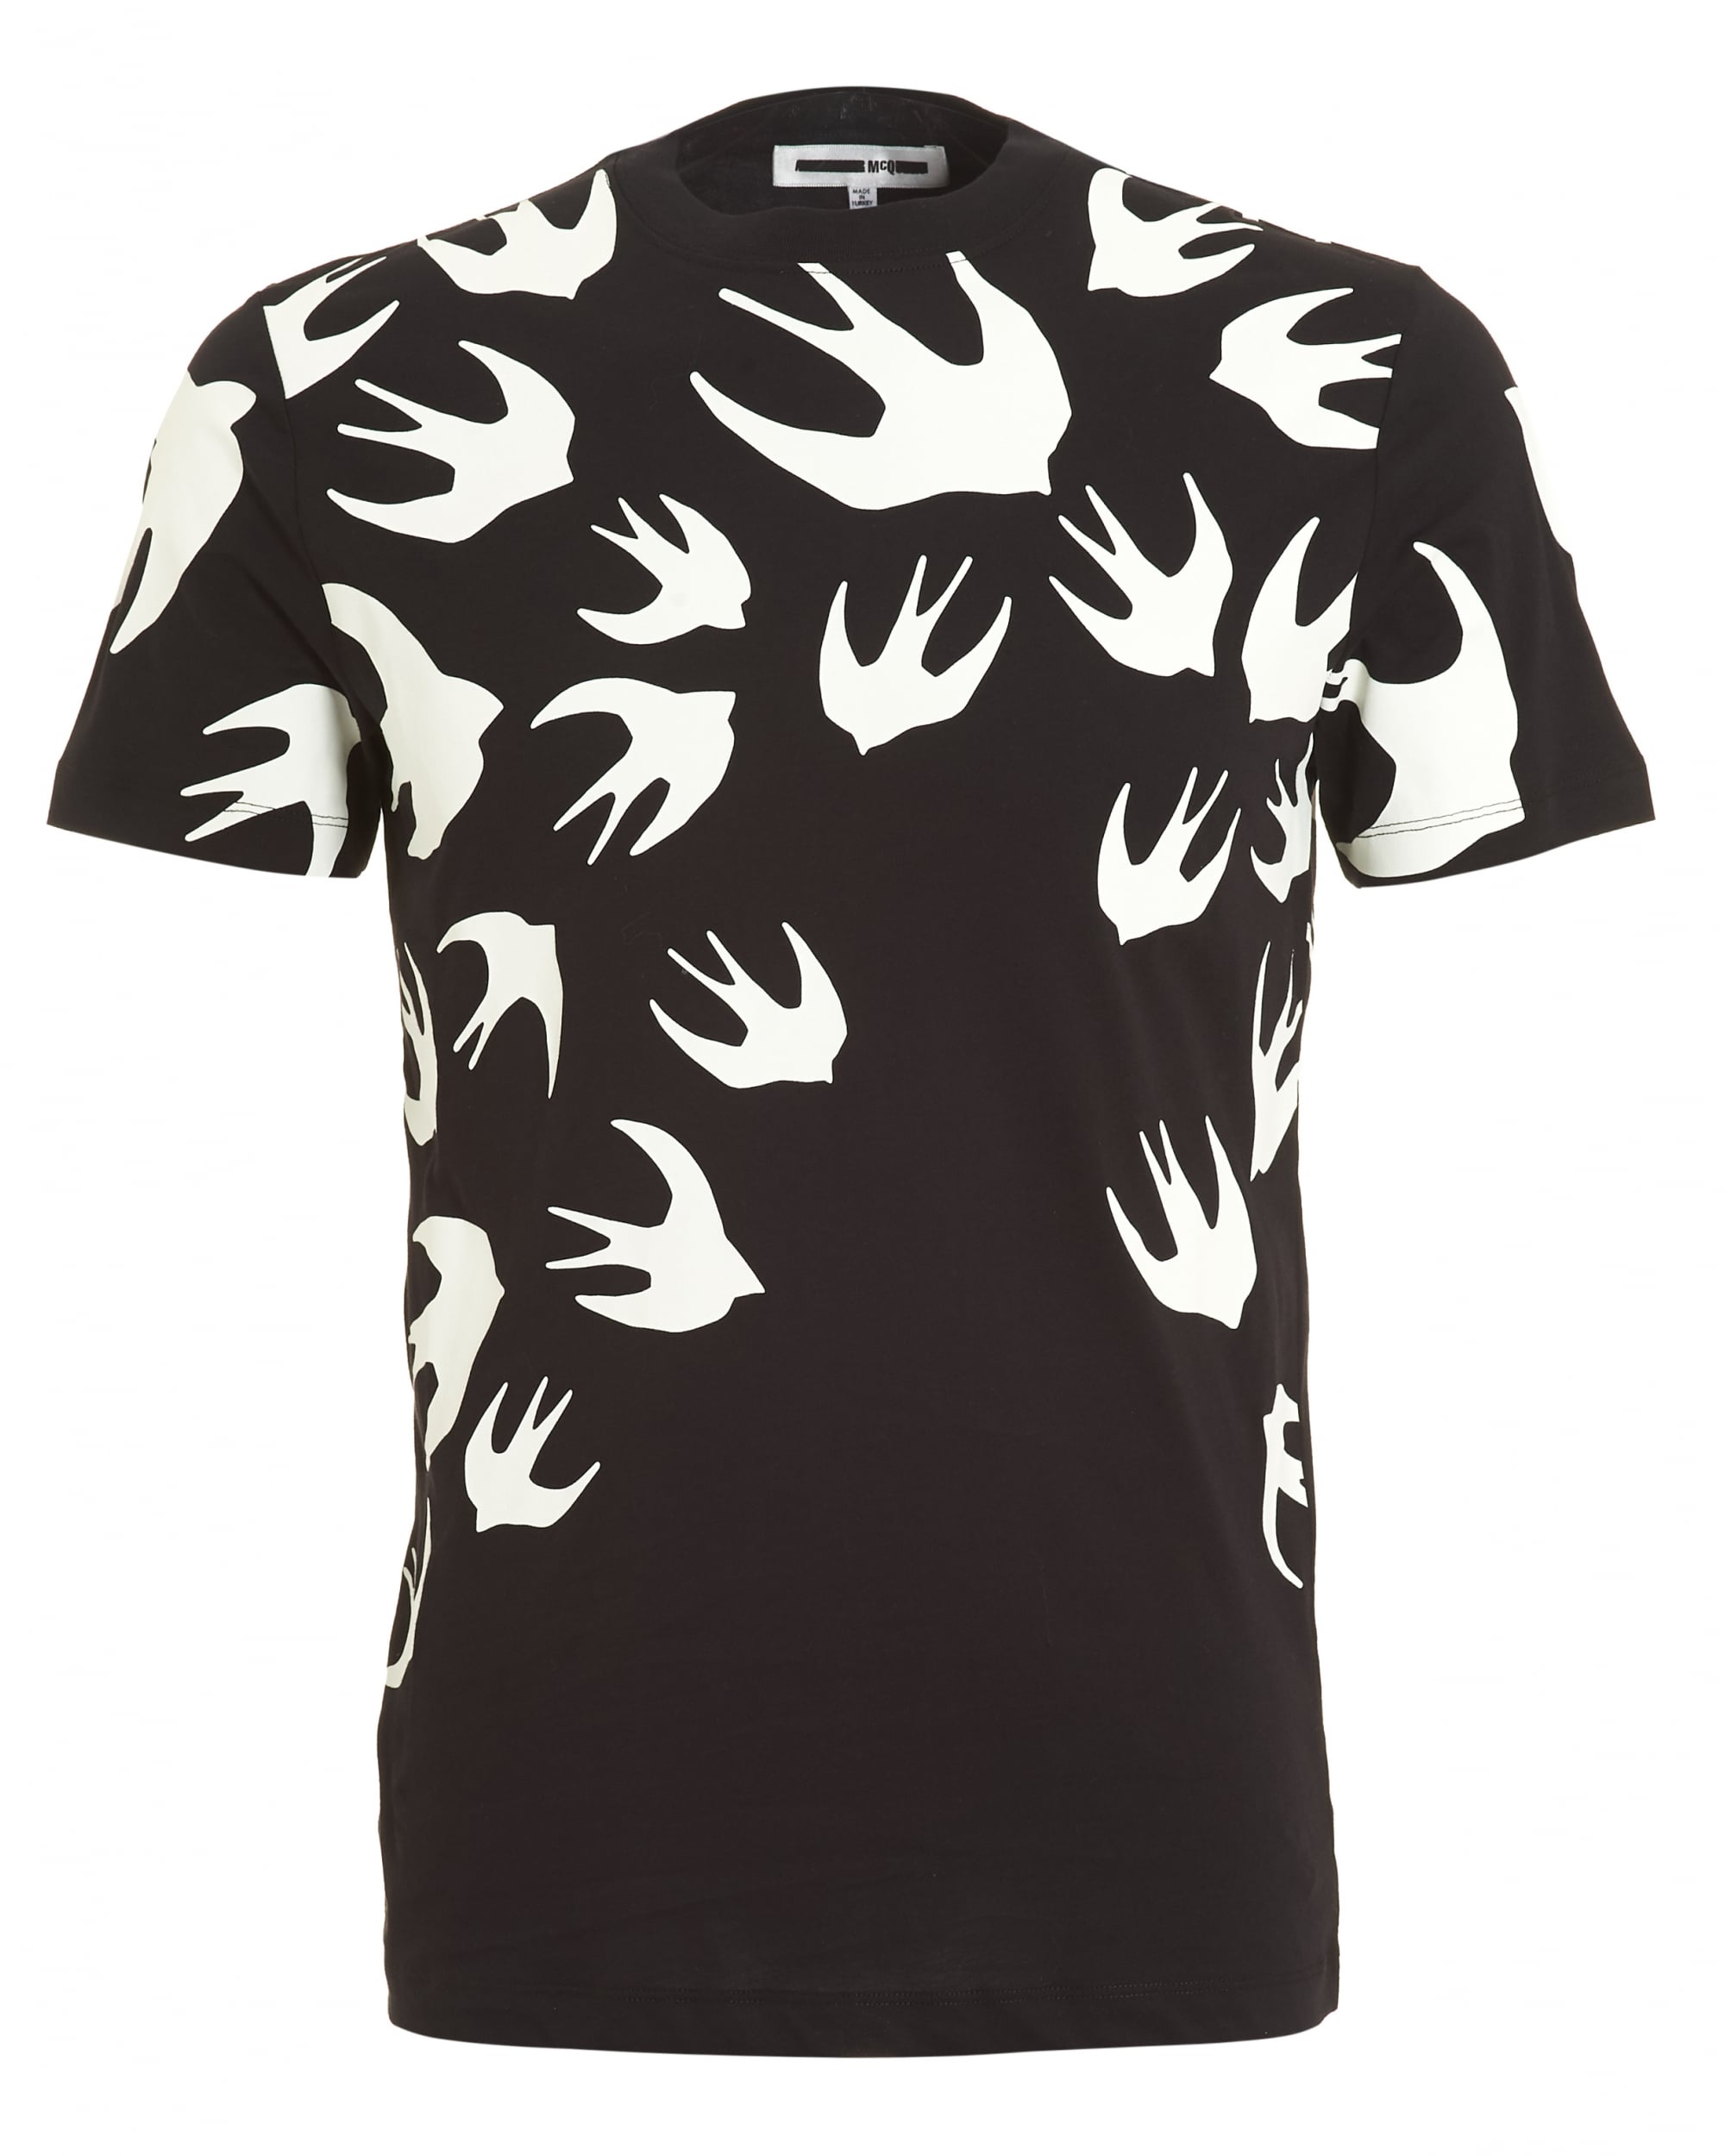 Mcq by alexander mcqueen mens swallow swarm print t shirt for Alexander mcqueen shirt men